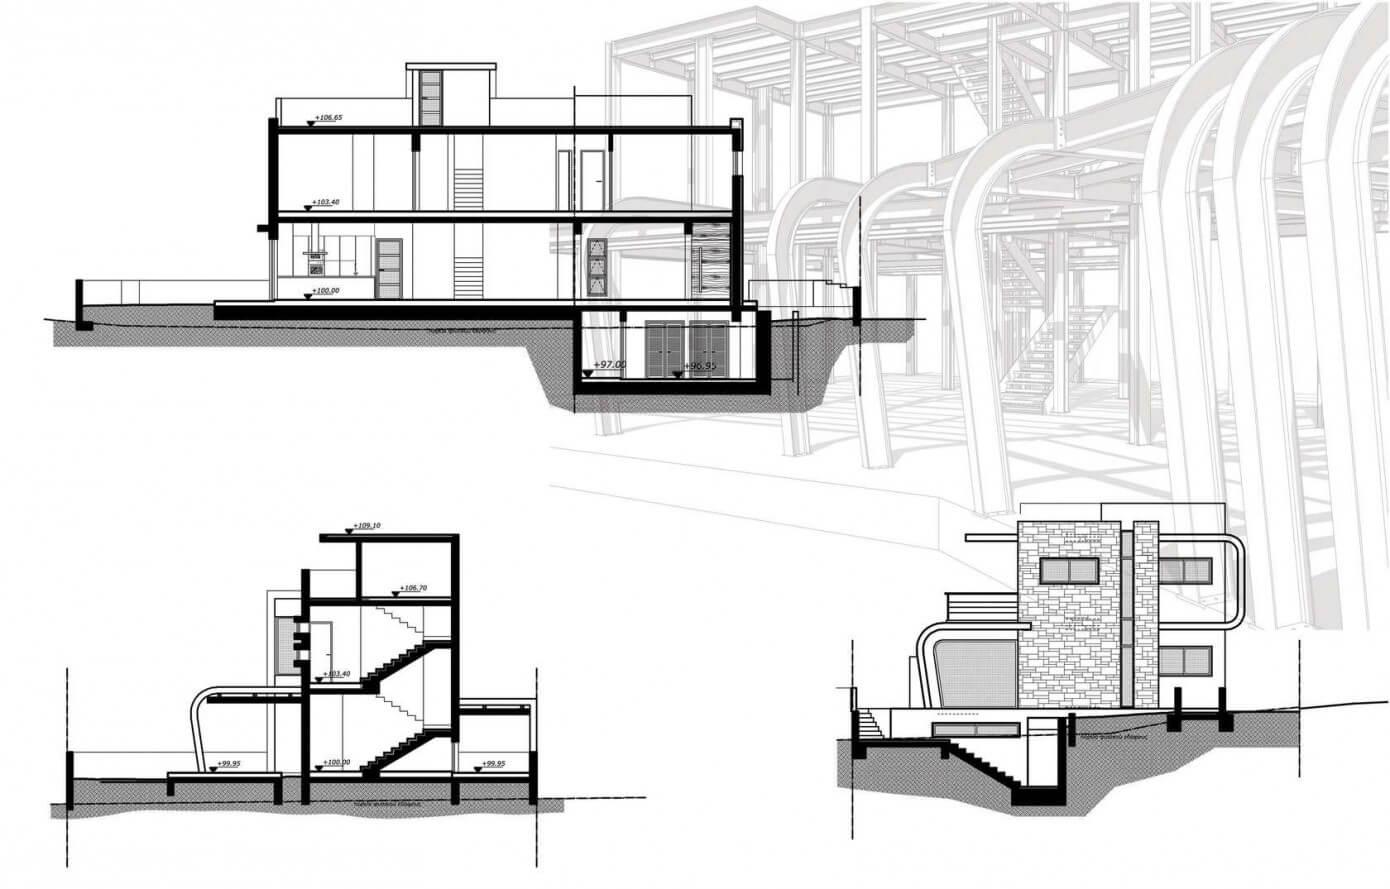 Dise o de casa moderna de dos plantas for Planos de casas de 2 plantas